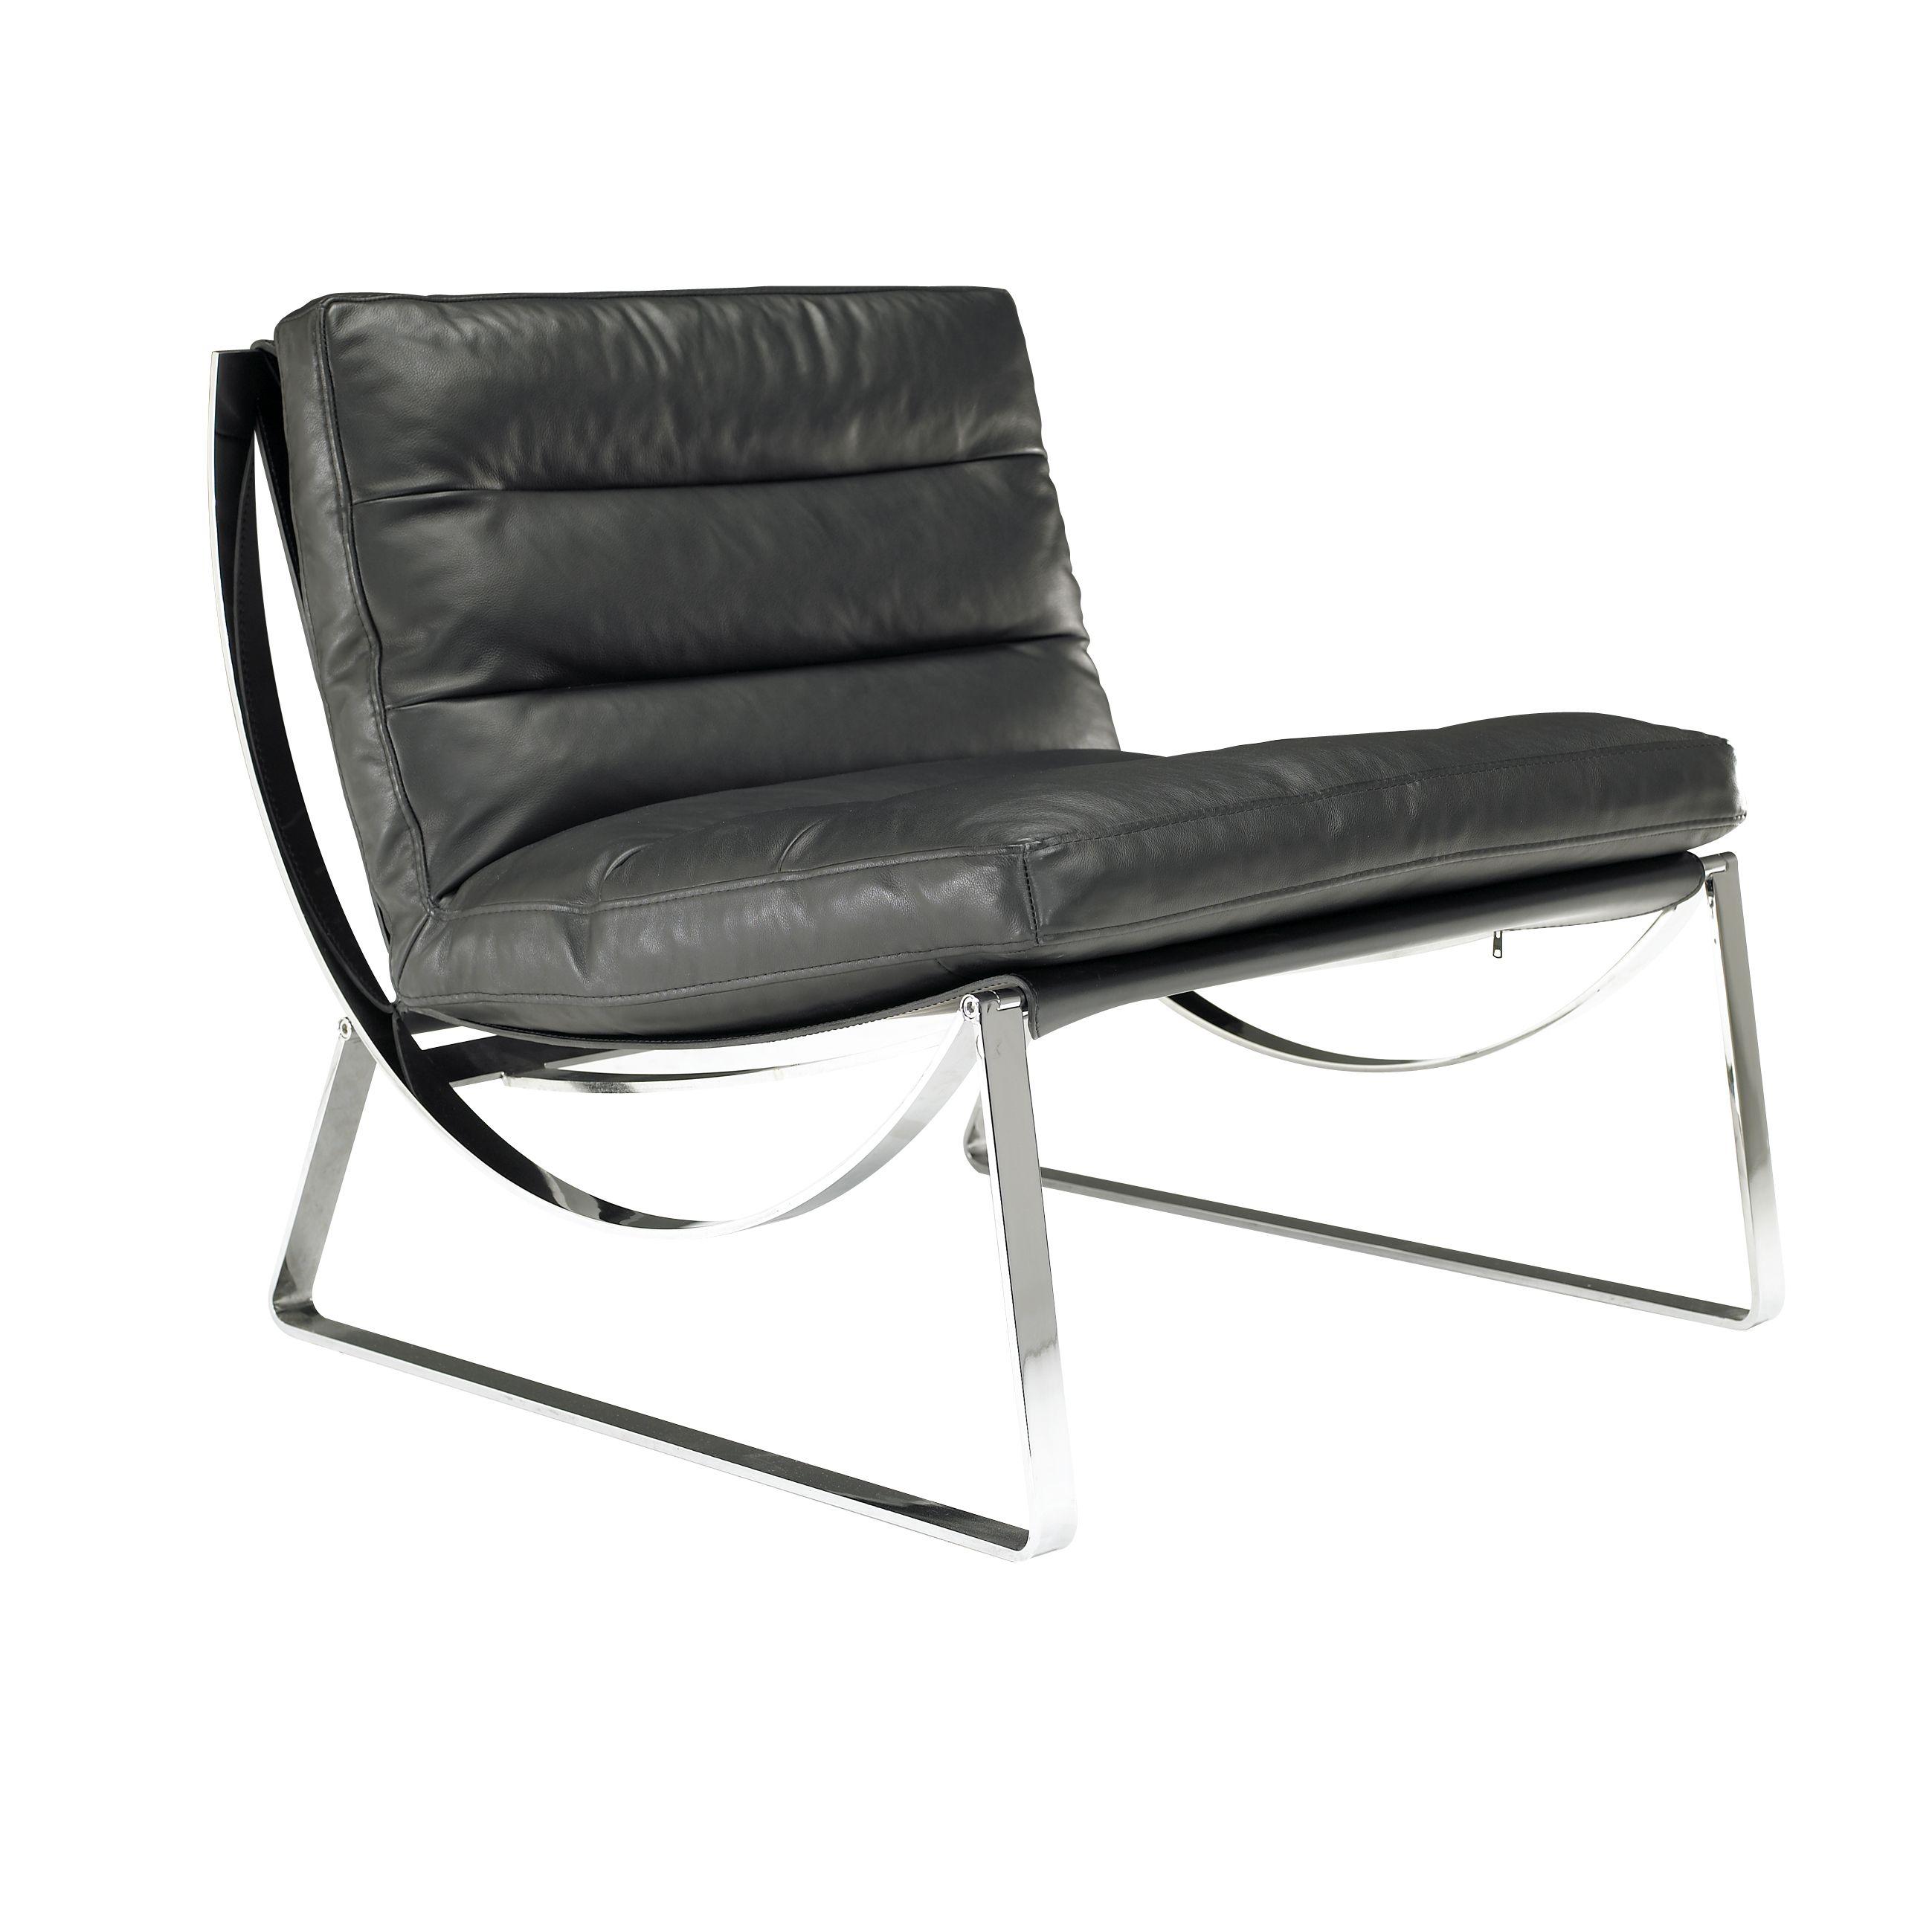 natuzzi lounge chair z line executive cammeo by italia fauteuils